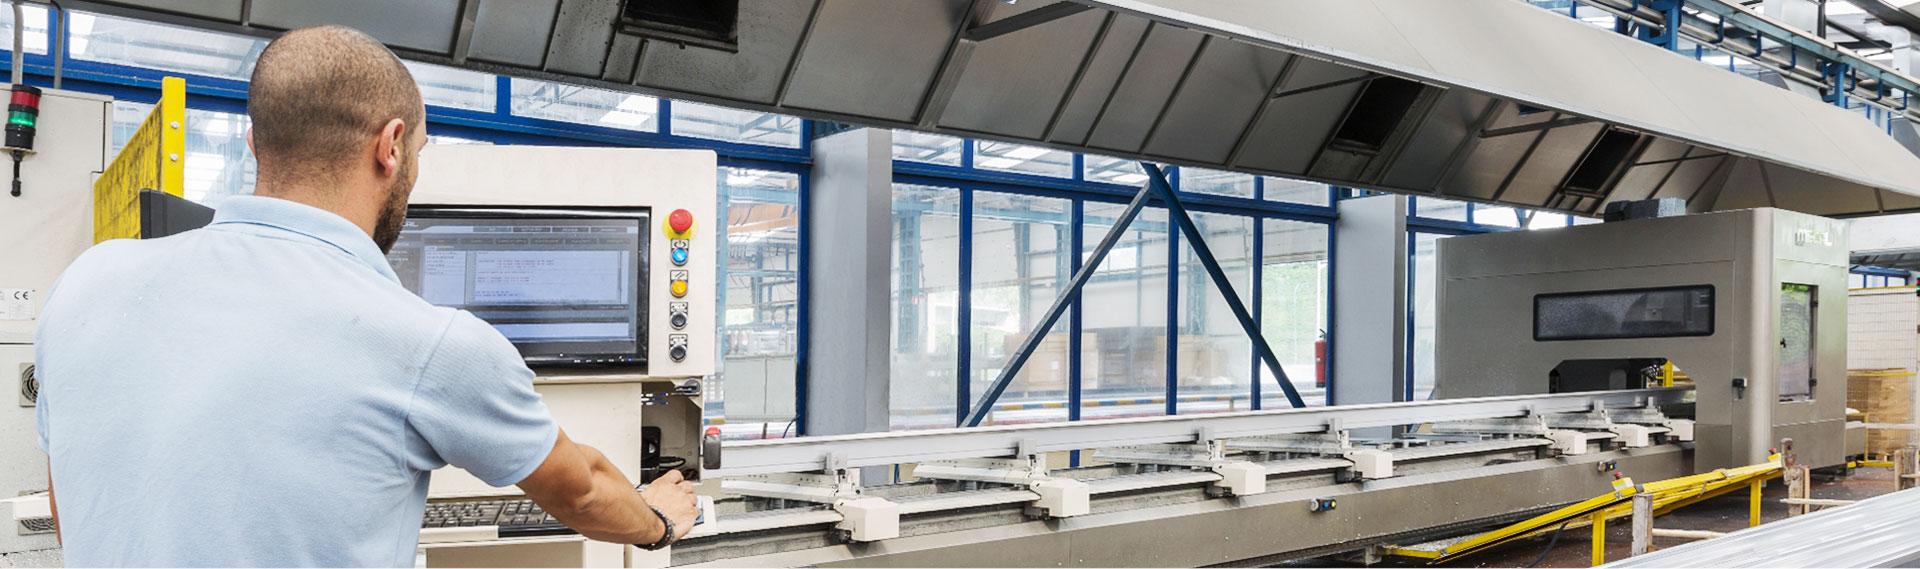 CNC işlem